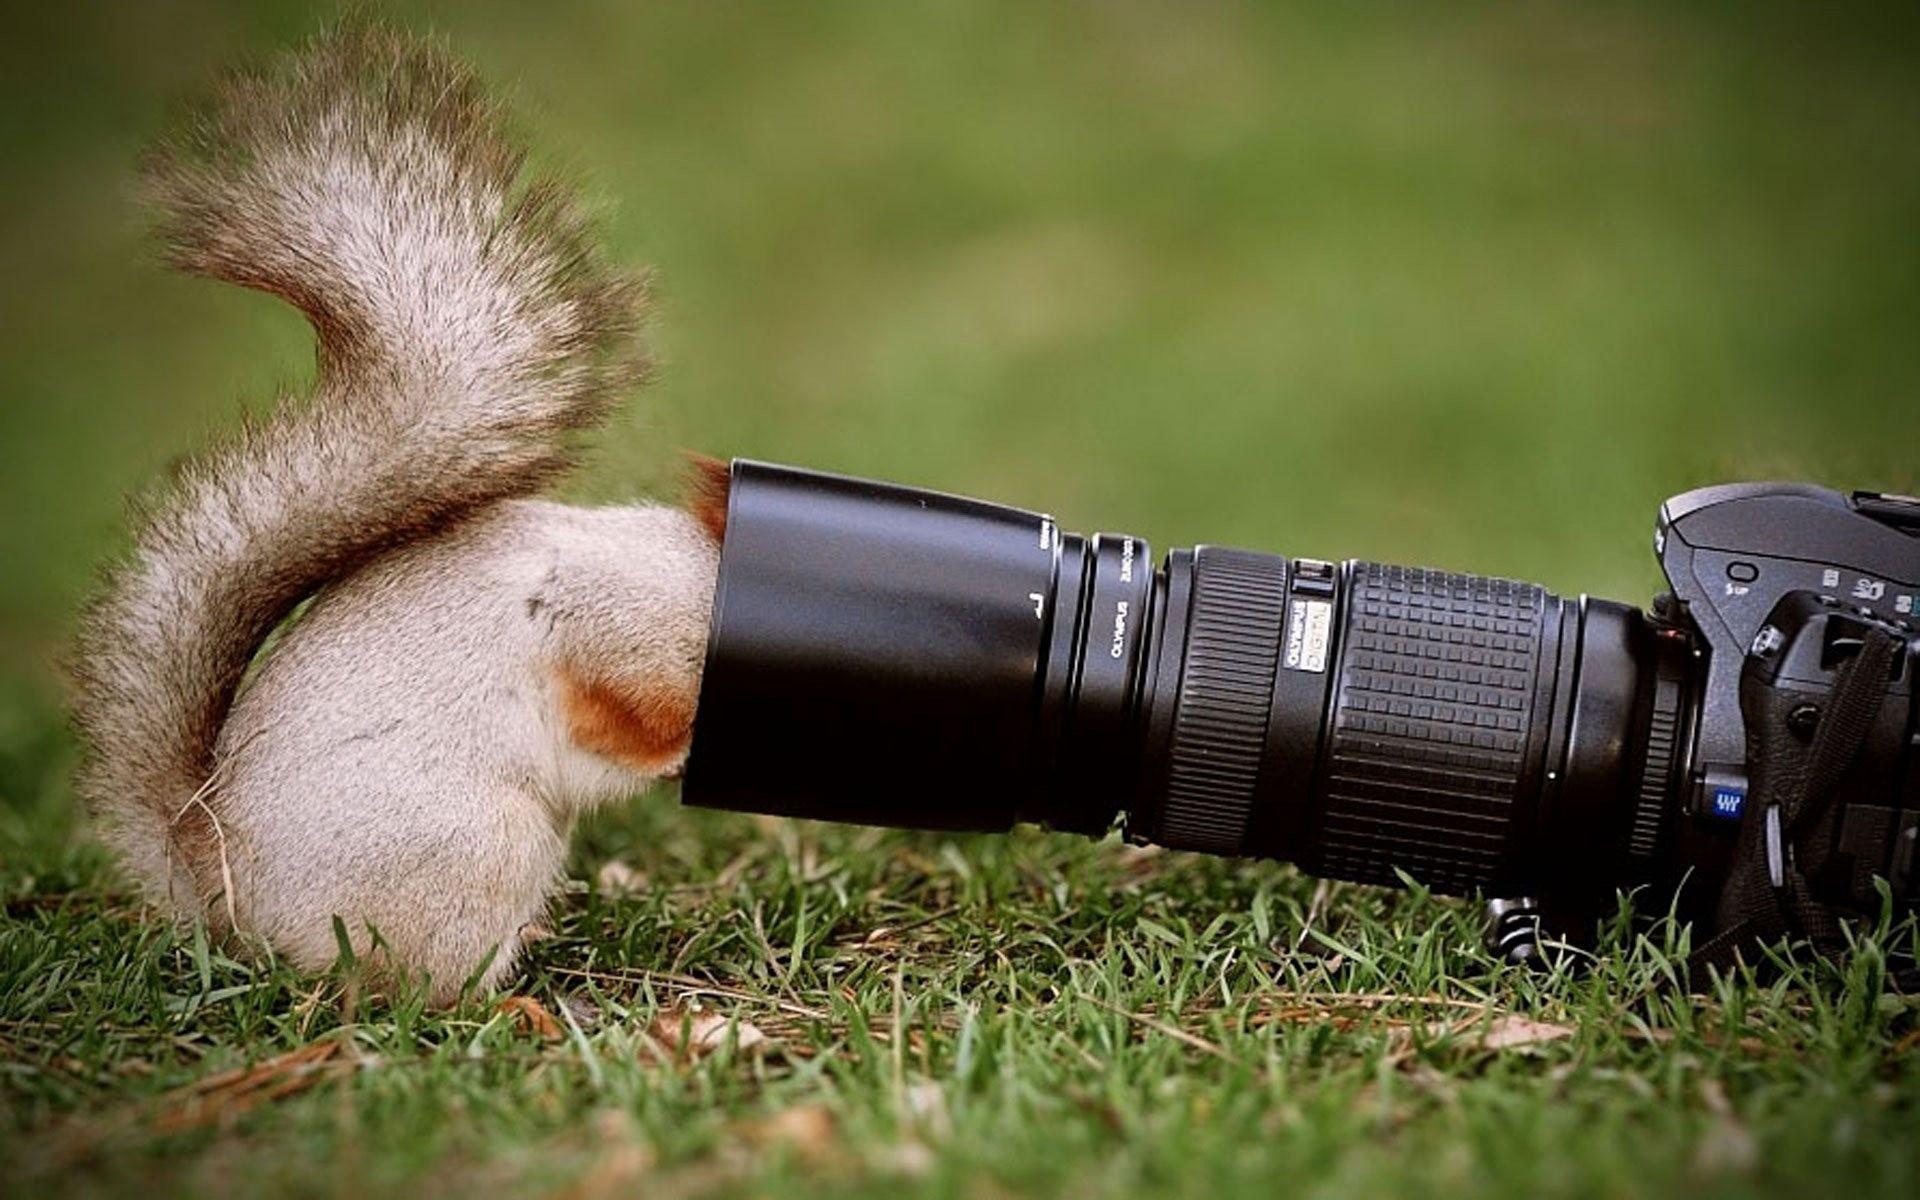 Презентация, картинки супер фотограф